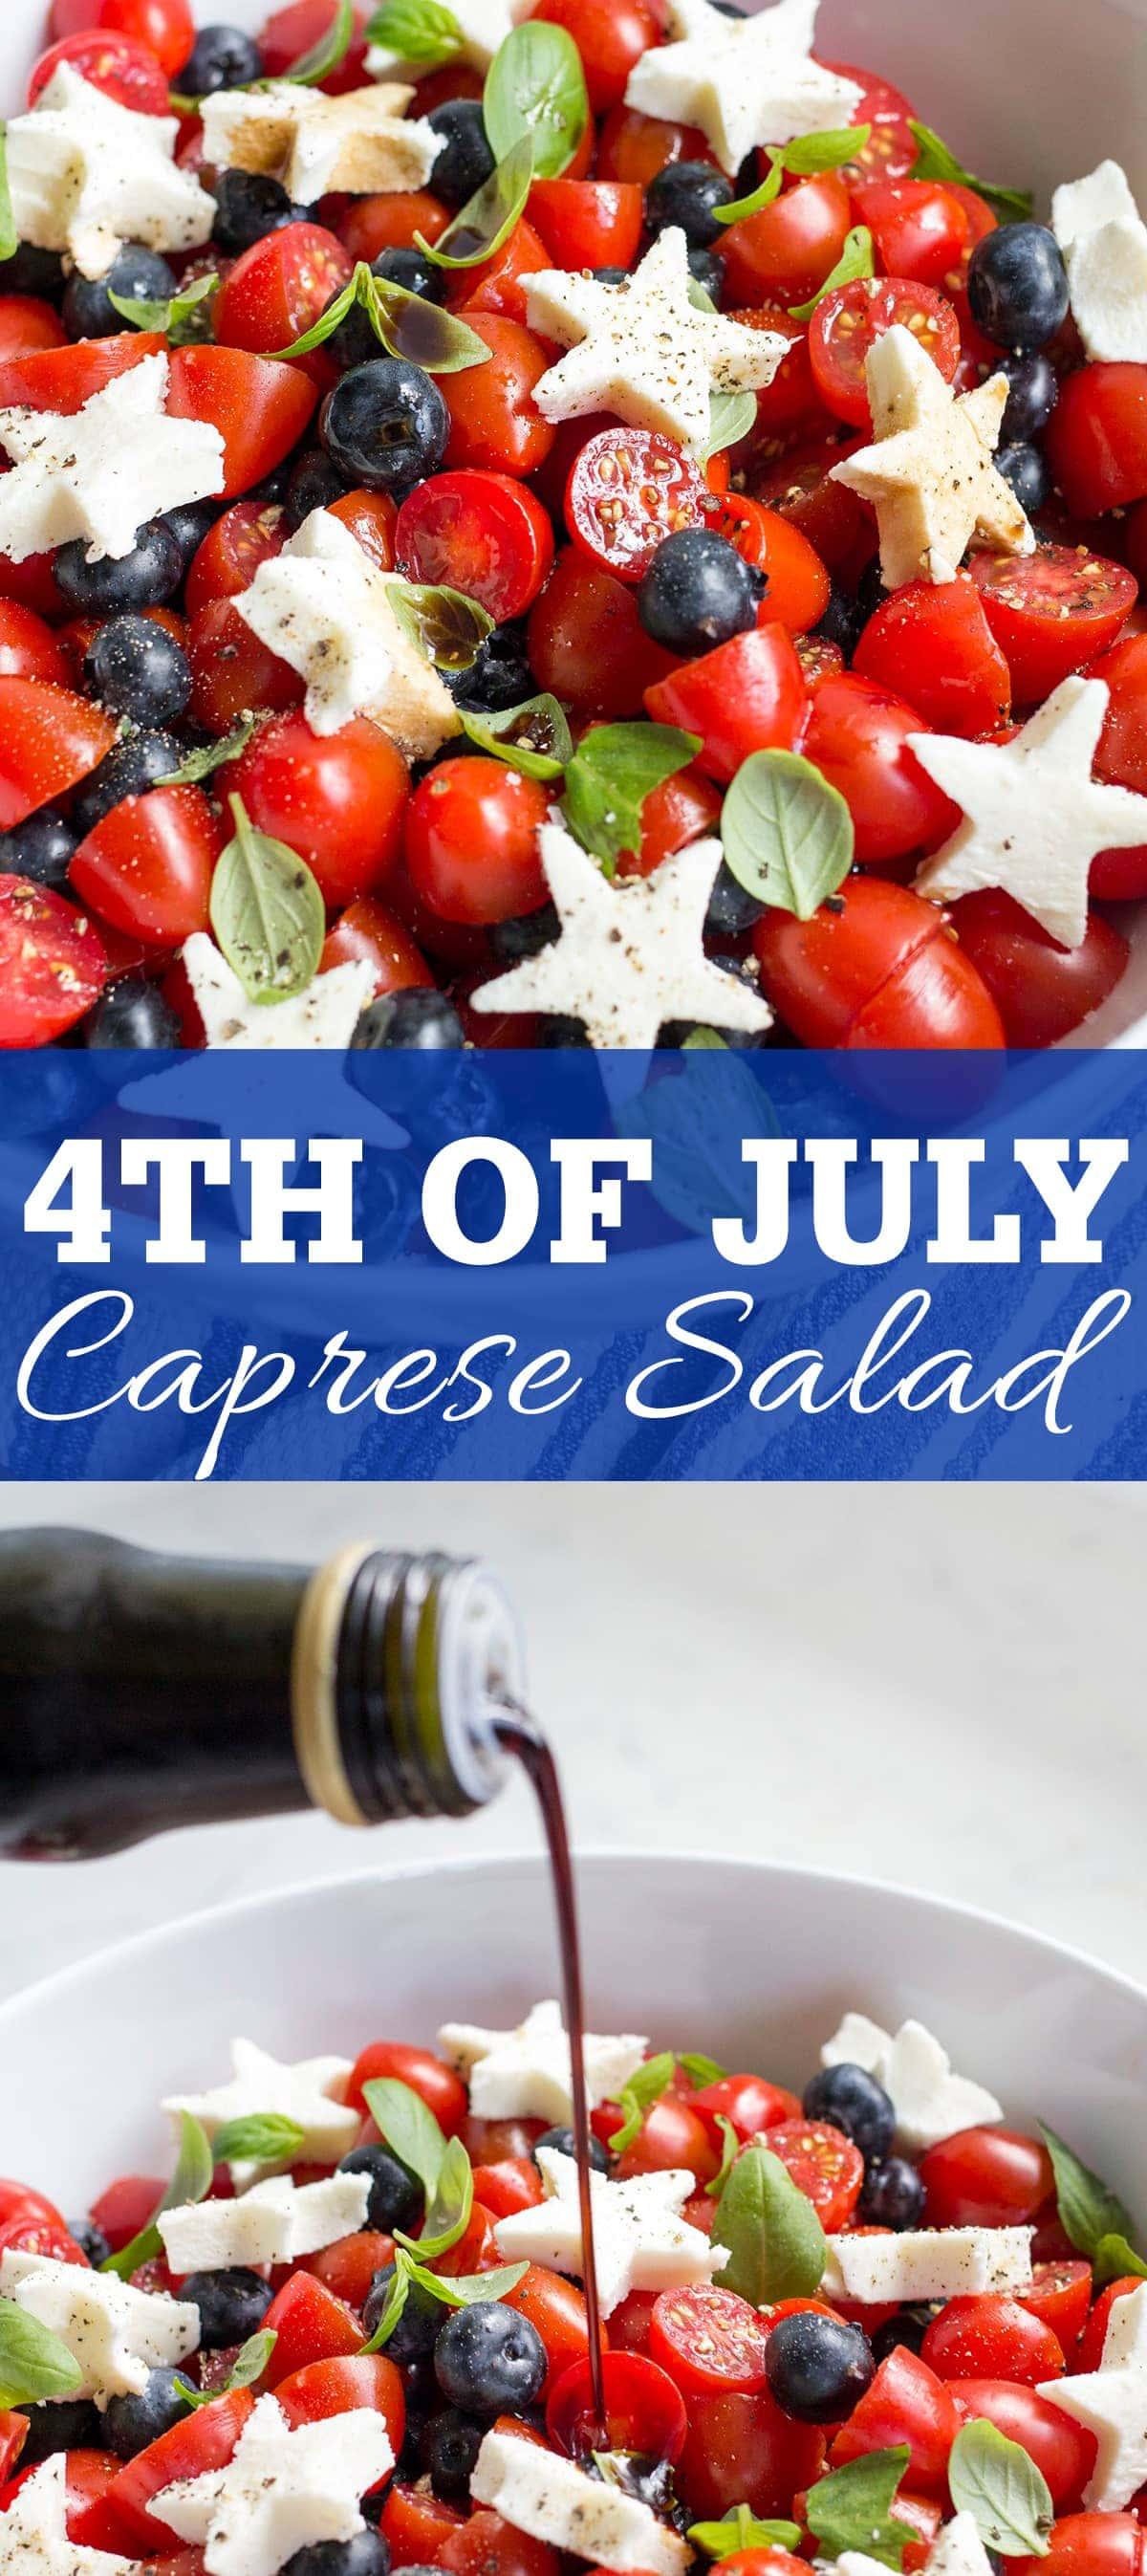 4th of July Caprese Salad